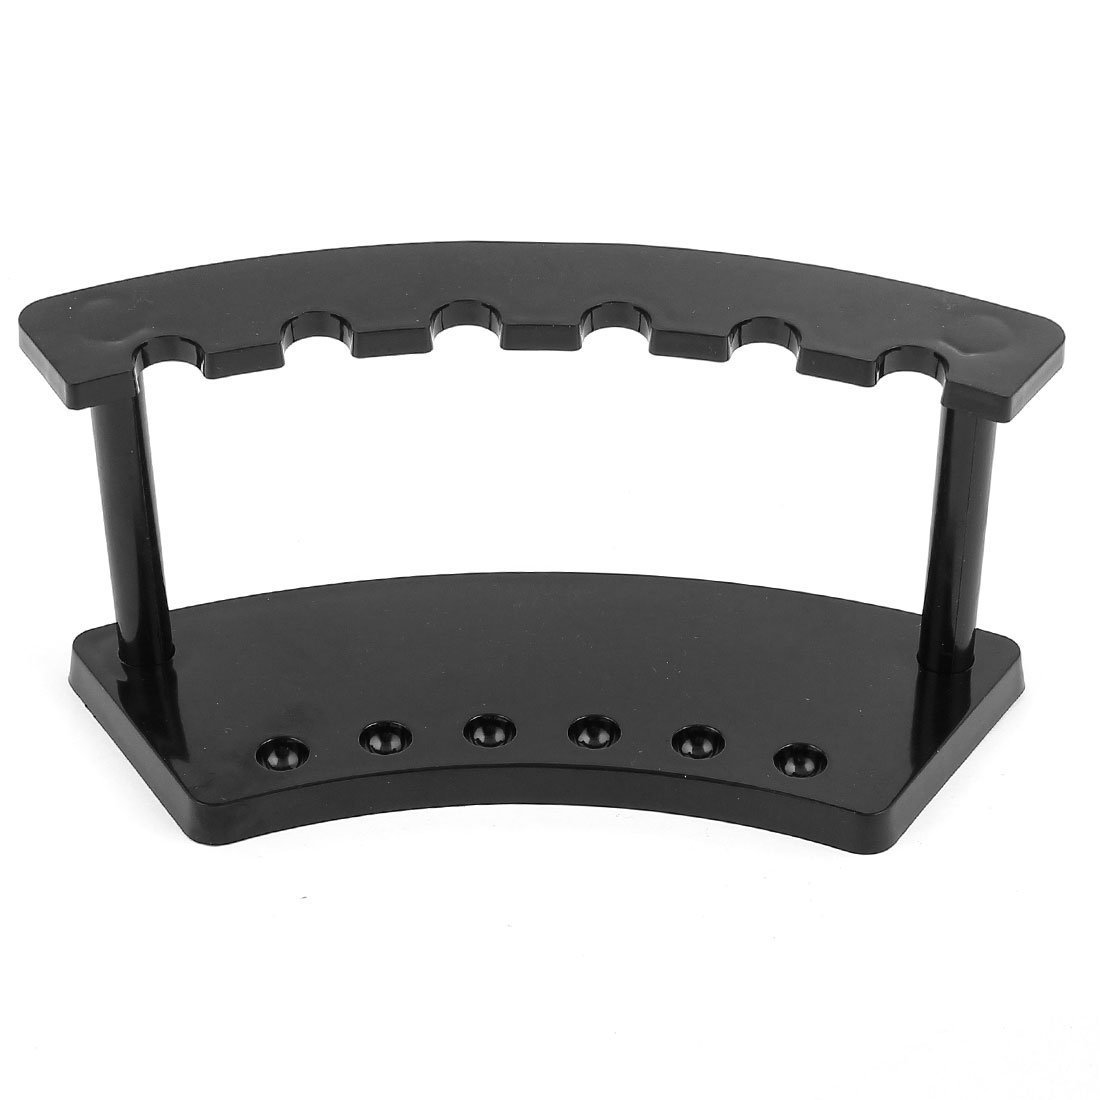 5X Office Desk Black Plastic 6 Position Pen Pencil Holder Stand